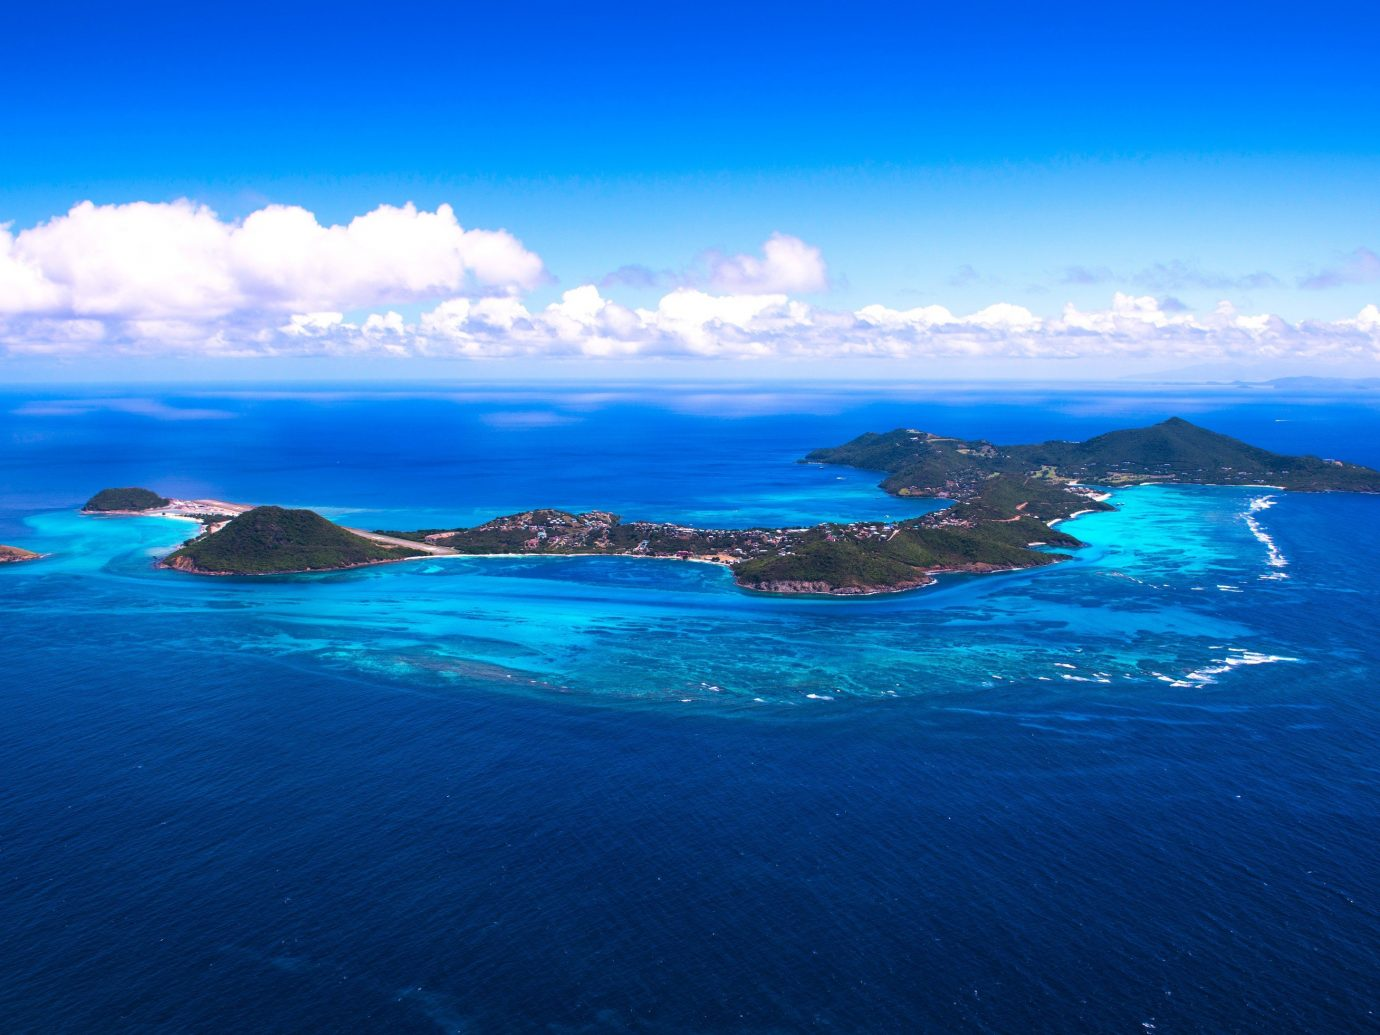 caribbean Secret Getaways Trip Ideas sky water outdoor blue Nature geographical feature landform Sea Coast Ocean horizon archipelago islet clouds reef cape Island bay arctic ocean terrain swimming